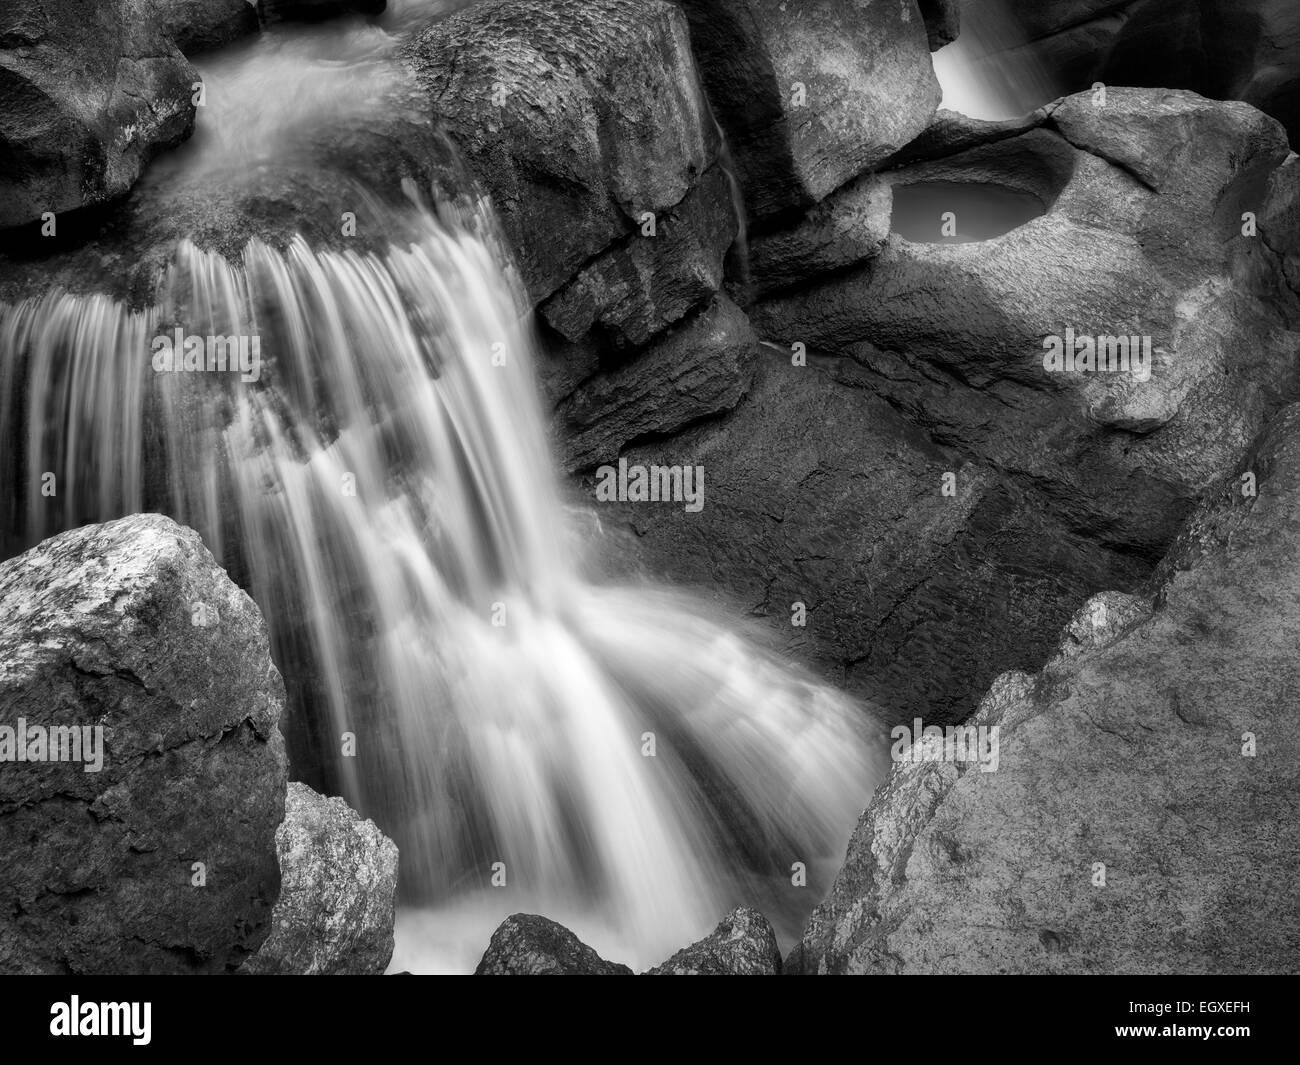 Abbassare Sunwapta Falls. Parco Nazionale di Jasper, Alberta, Canada Immagini Stock